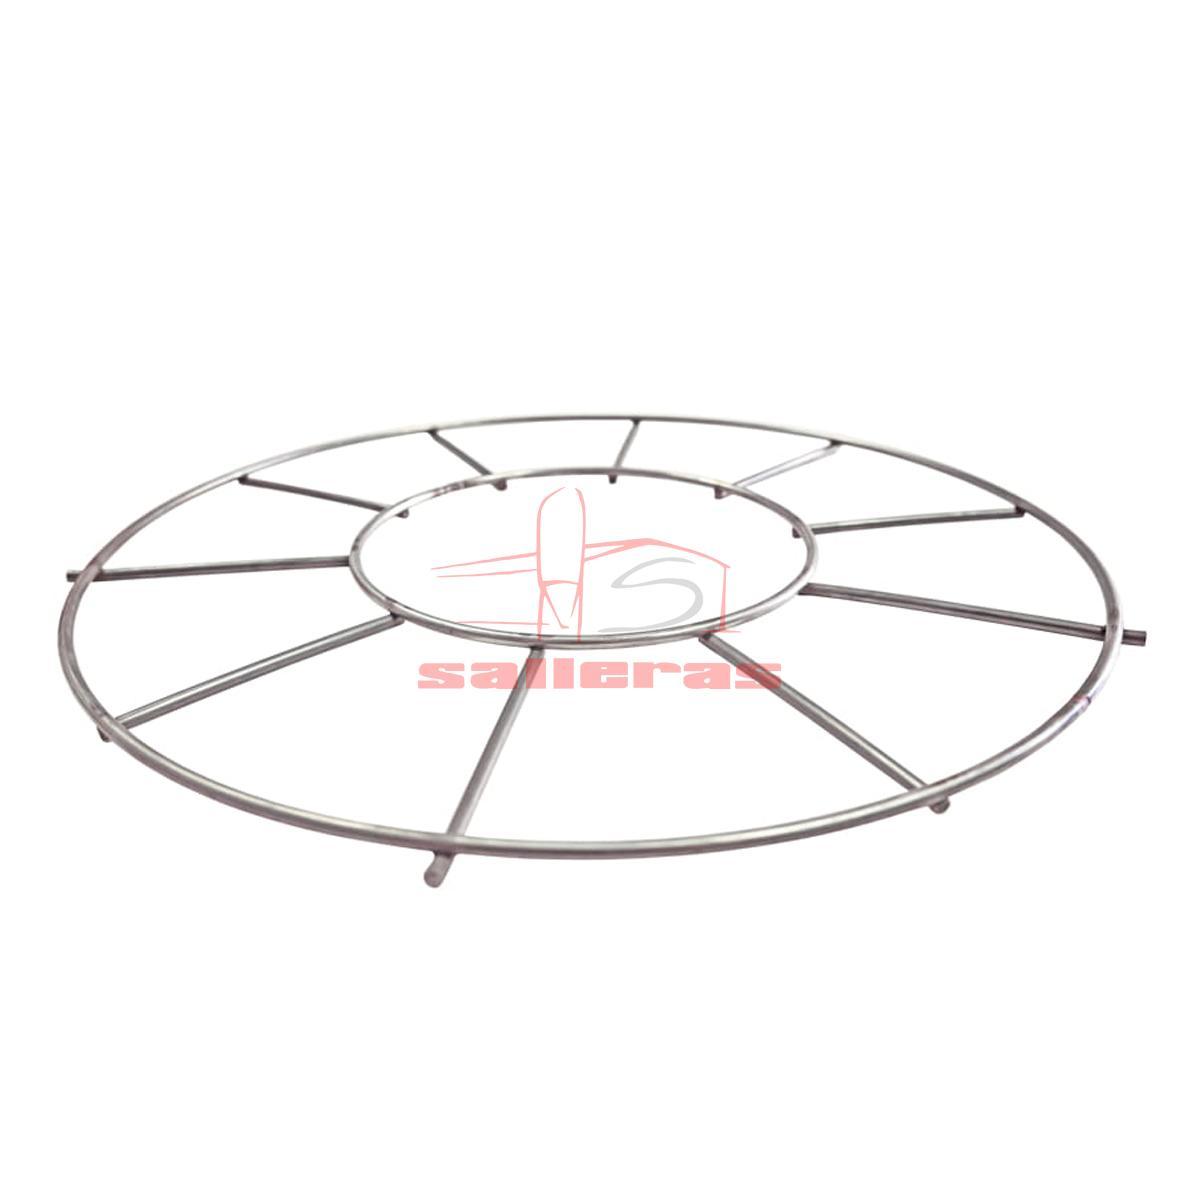 rejilla inoxidable circular reves